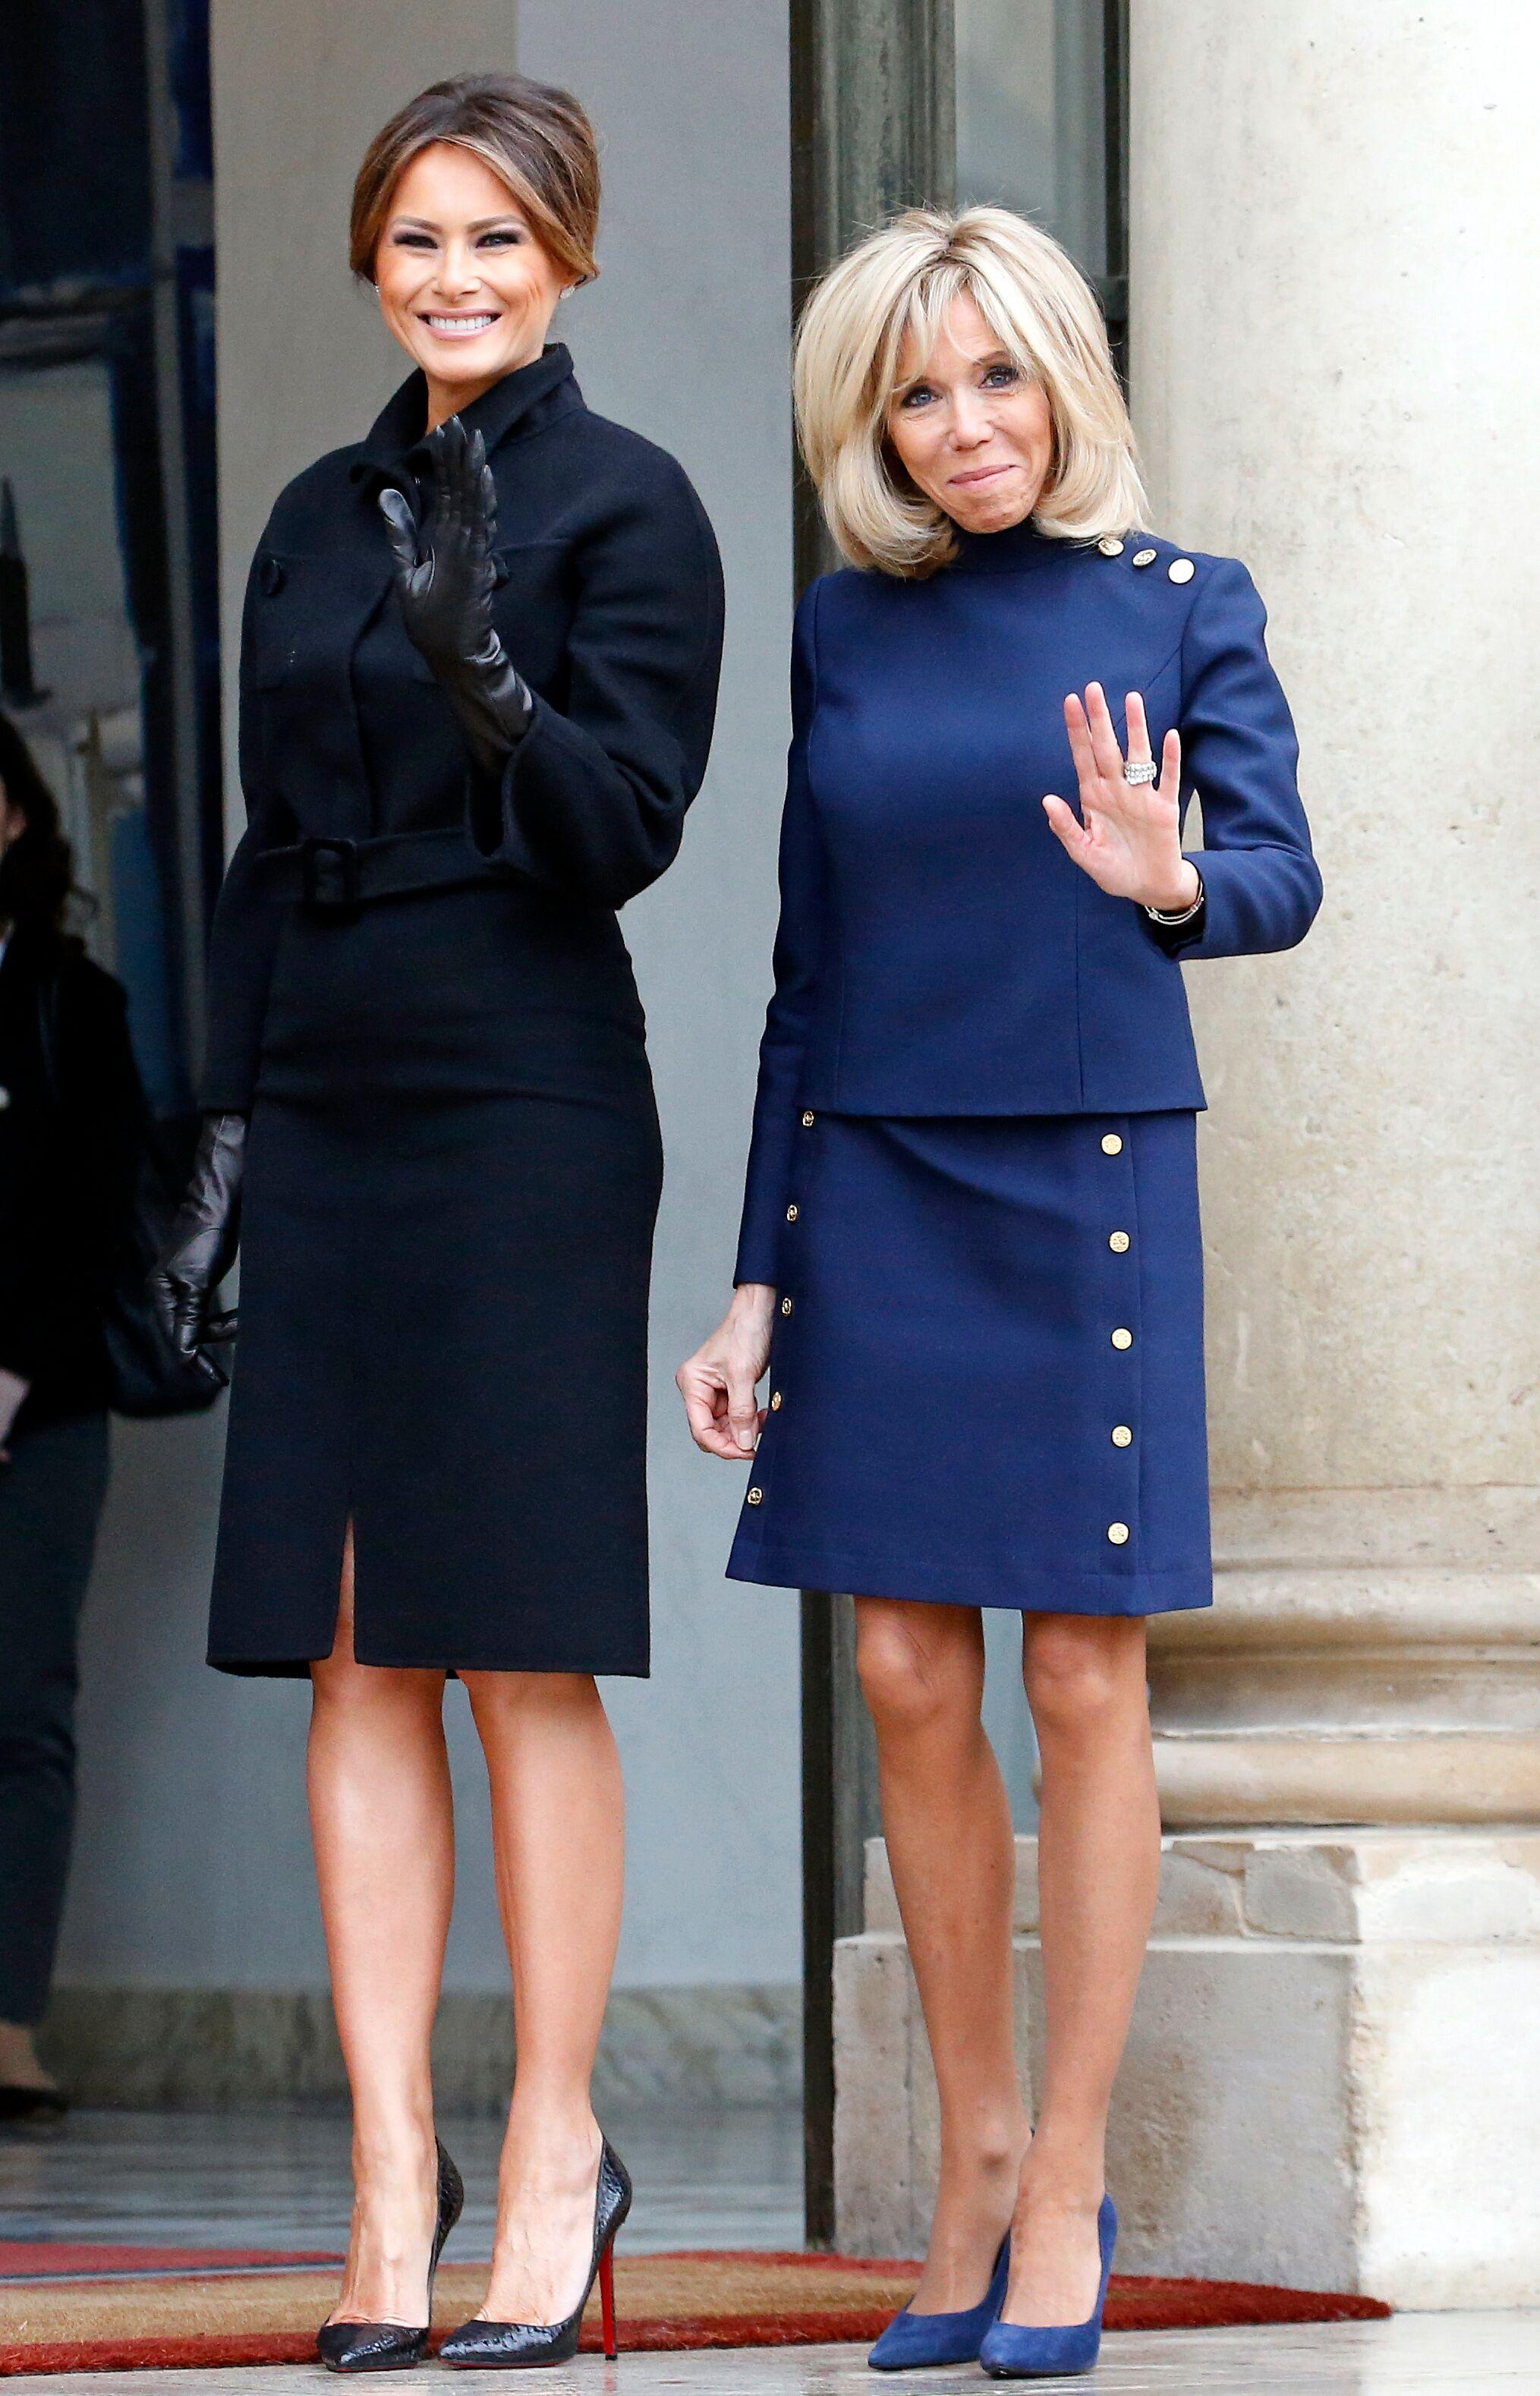 Brigitte Macron en compagnie de Melania Trump. l Source: Getty Images